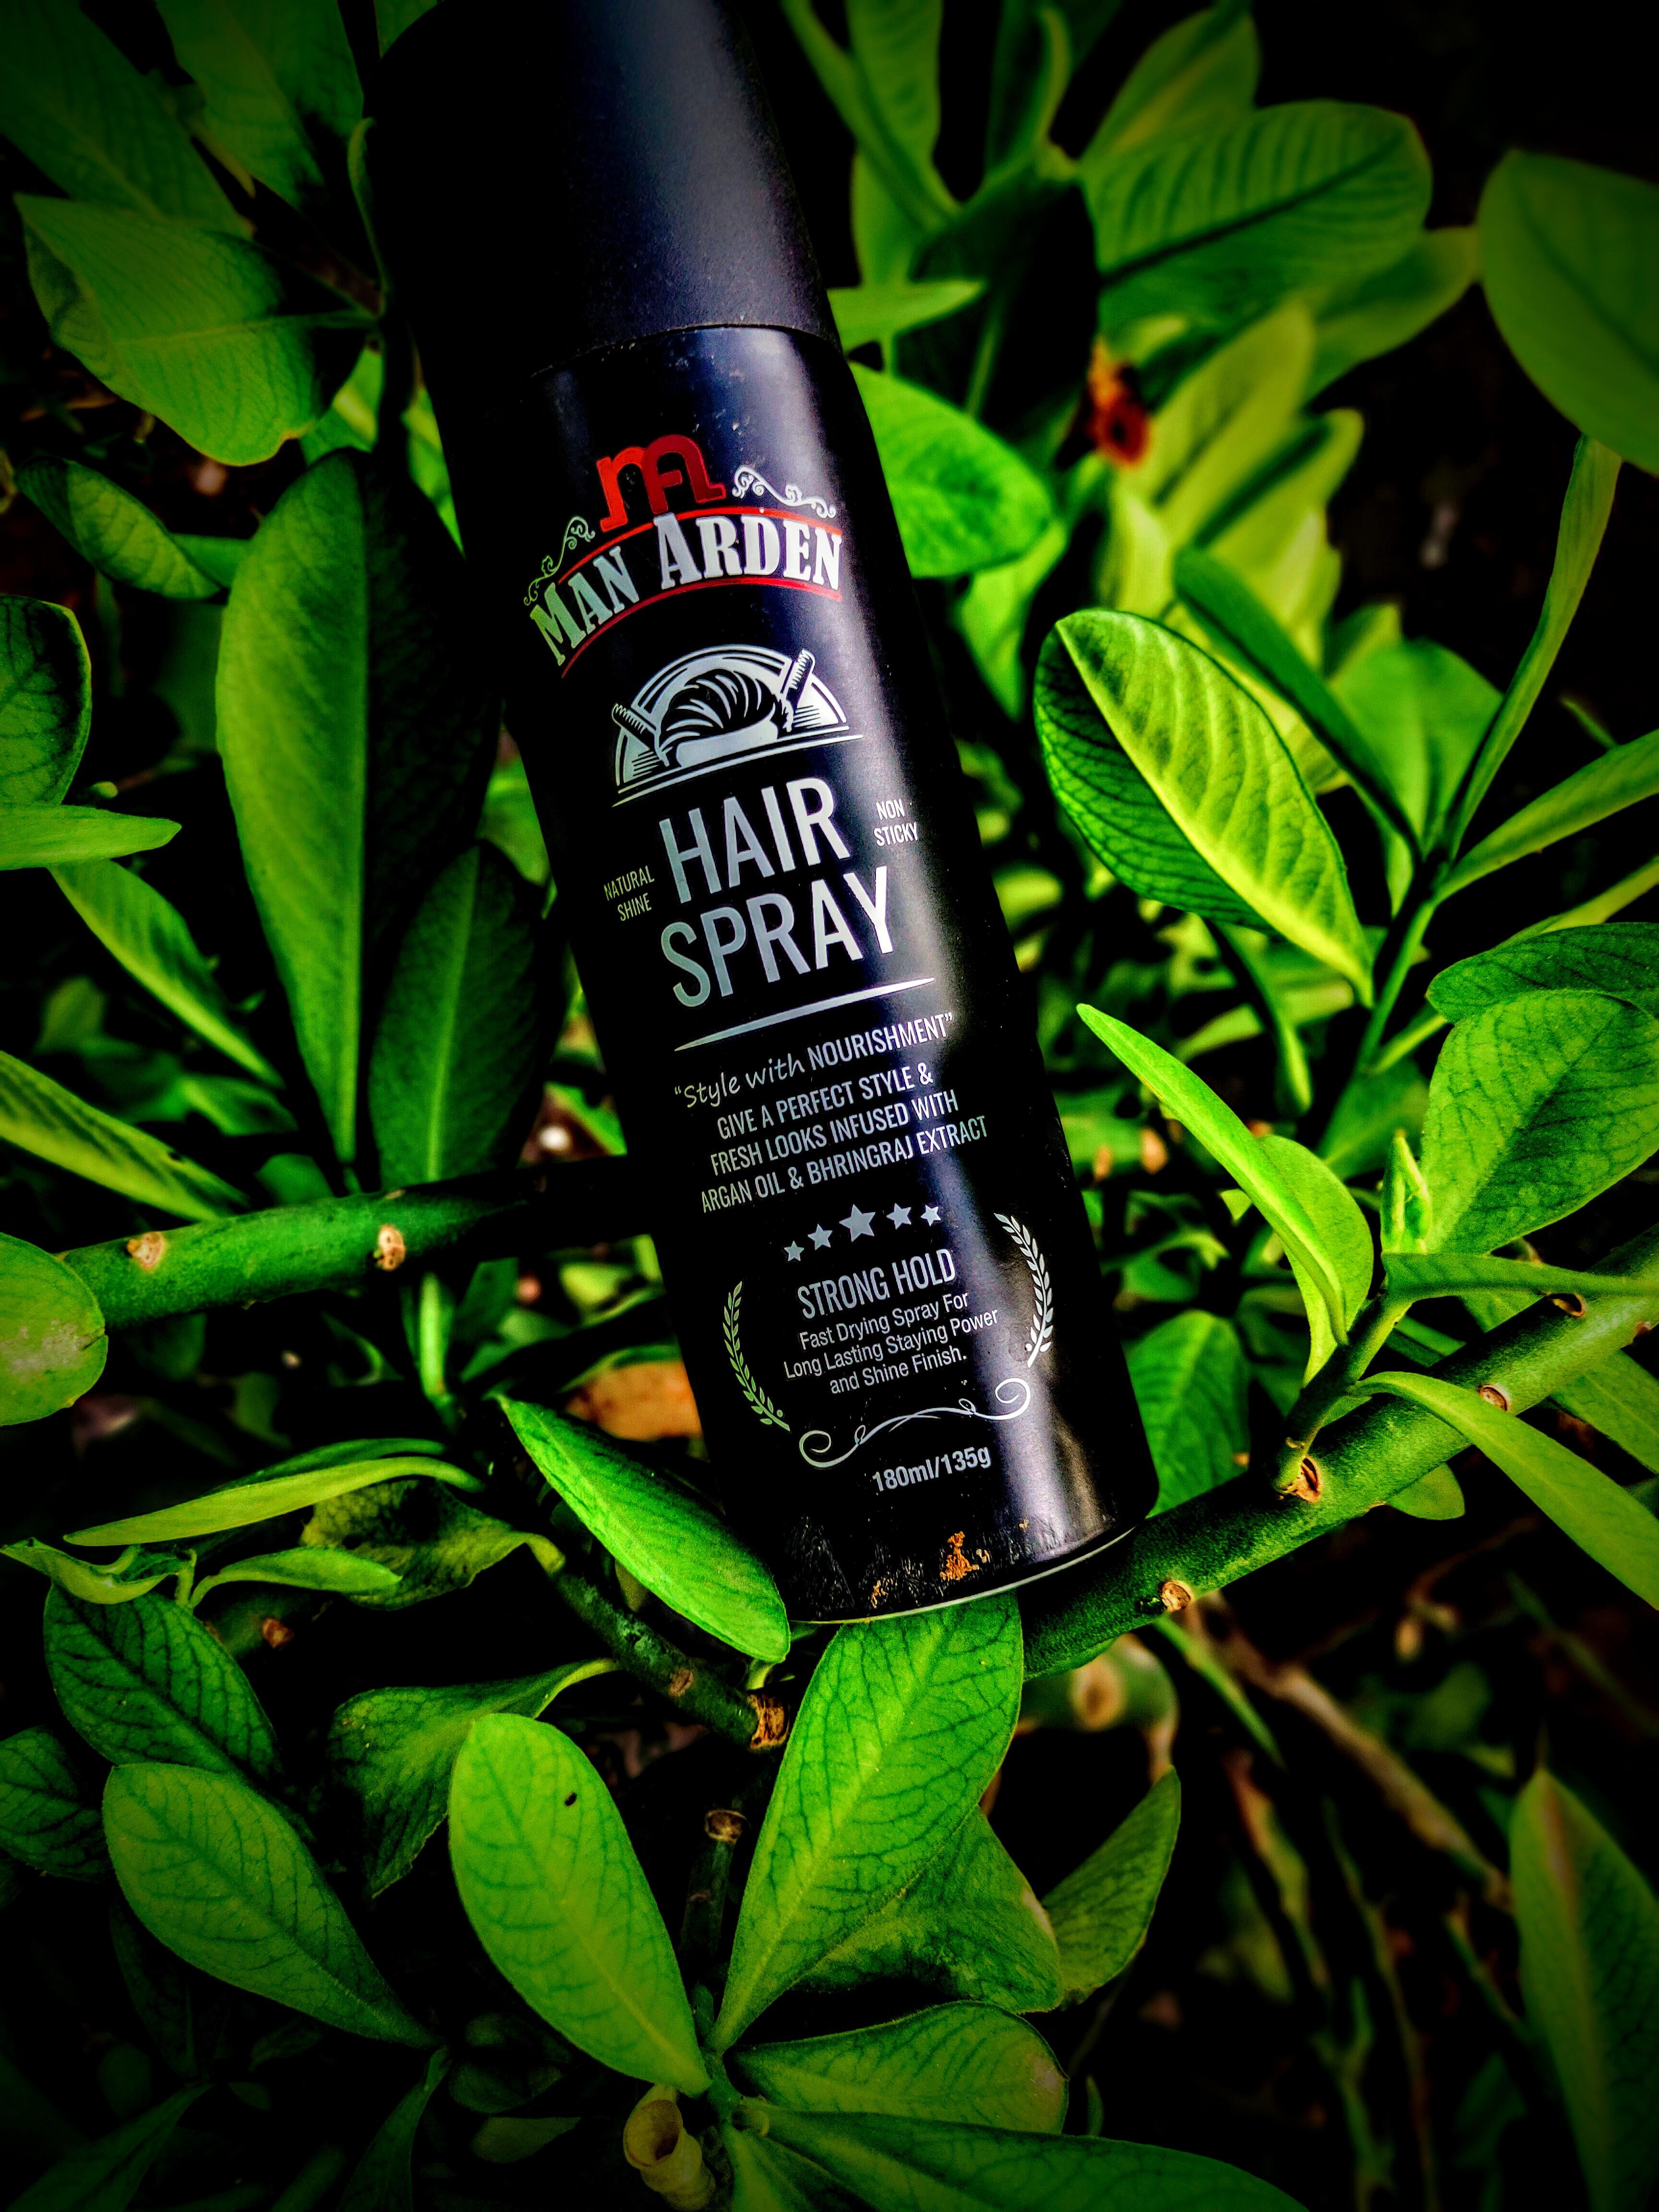 Man Arden Hair Spray-Amazing Product-By shagunsharma